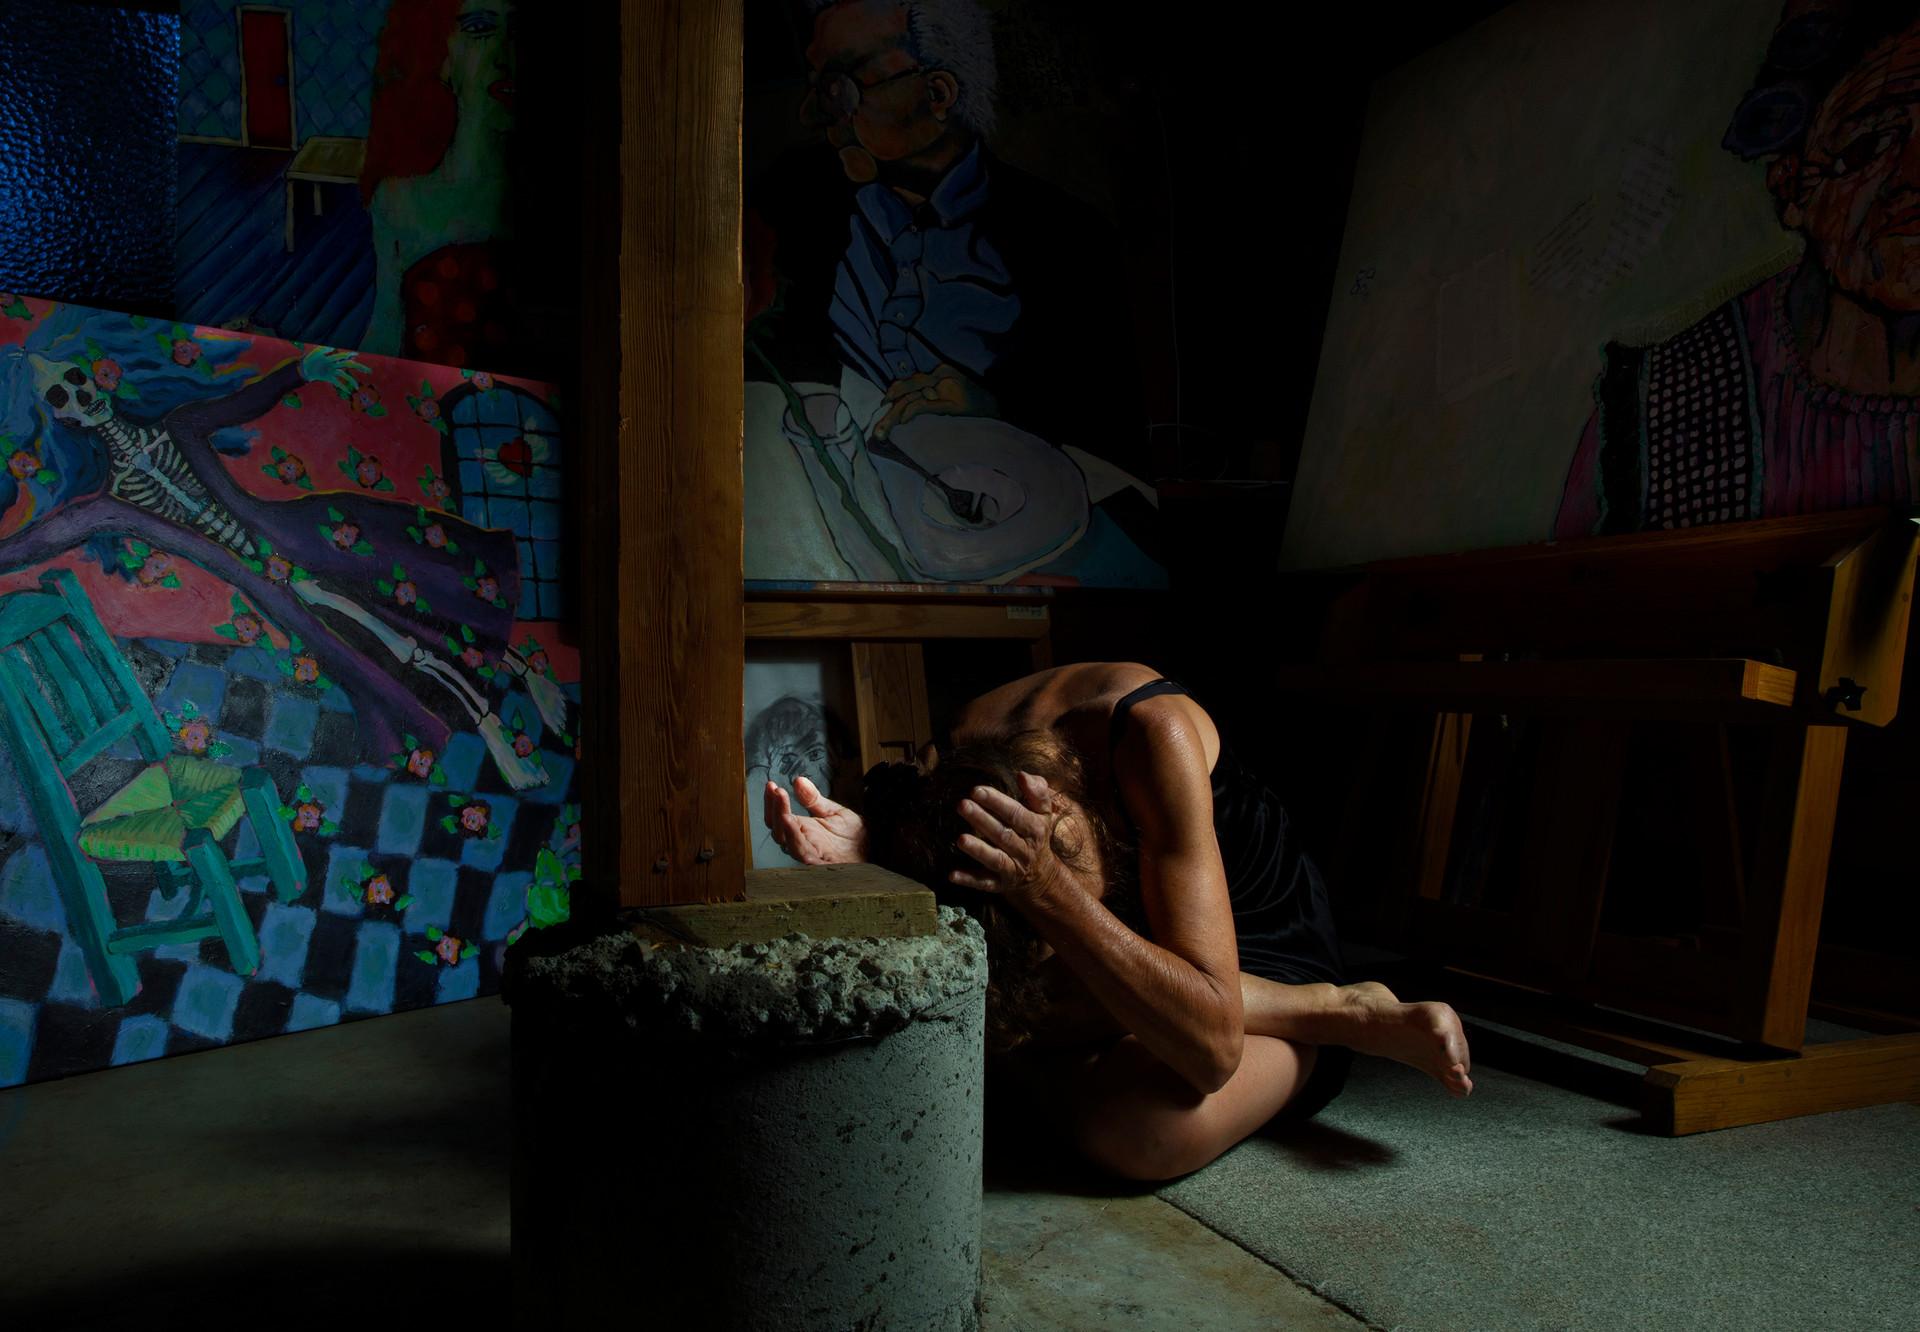 Harriet Garfinkle/ Dancer/ Painter